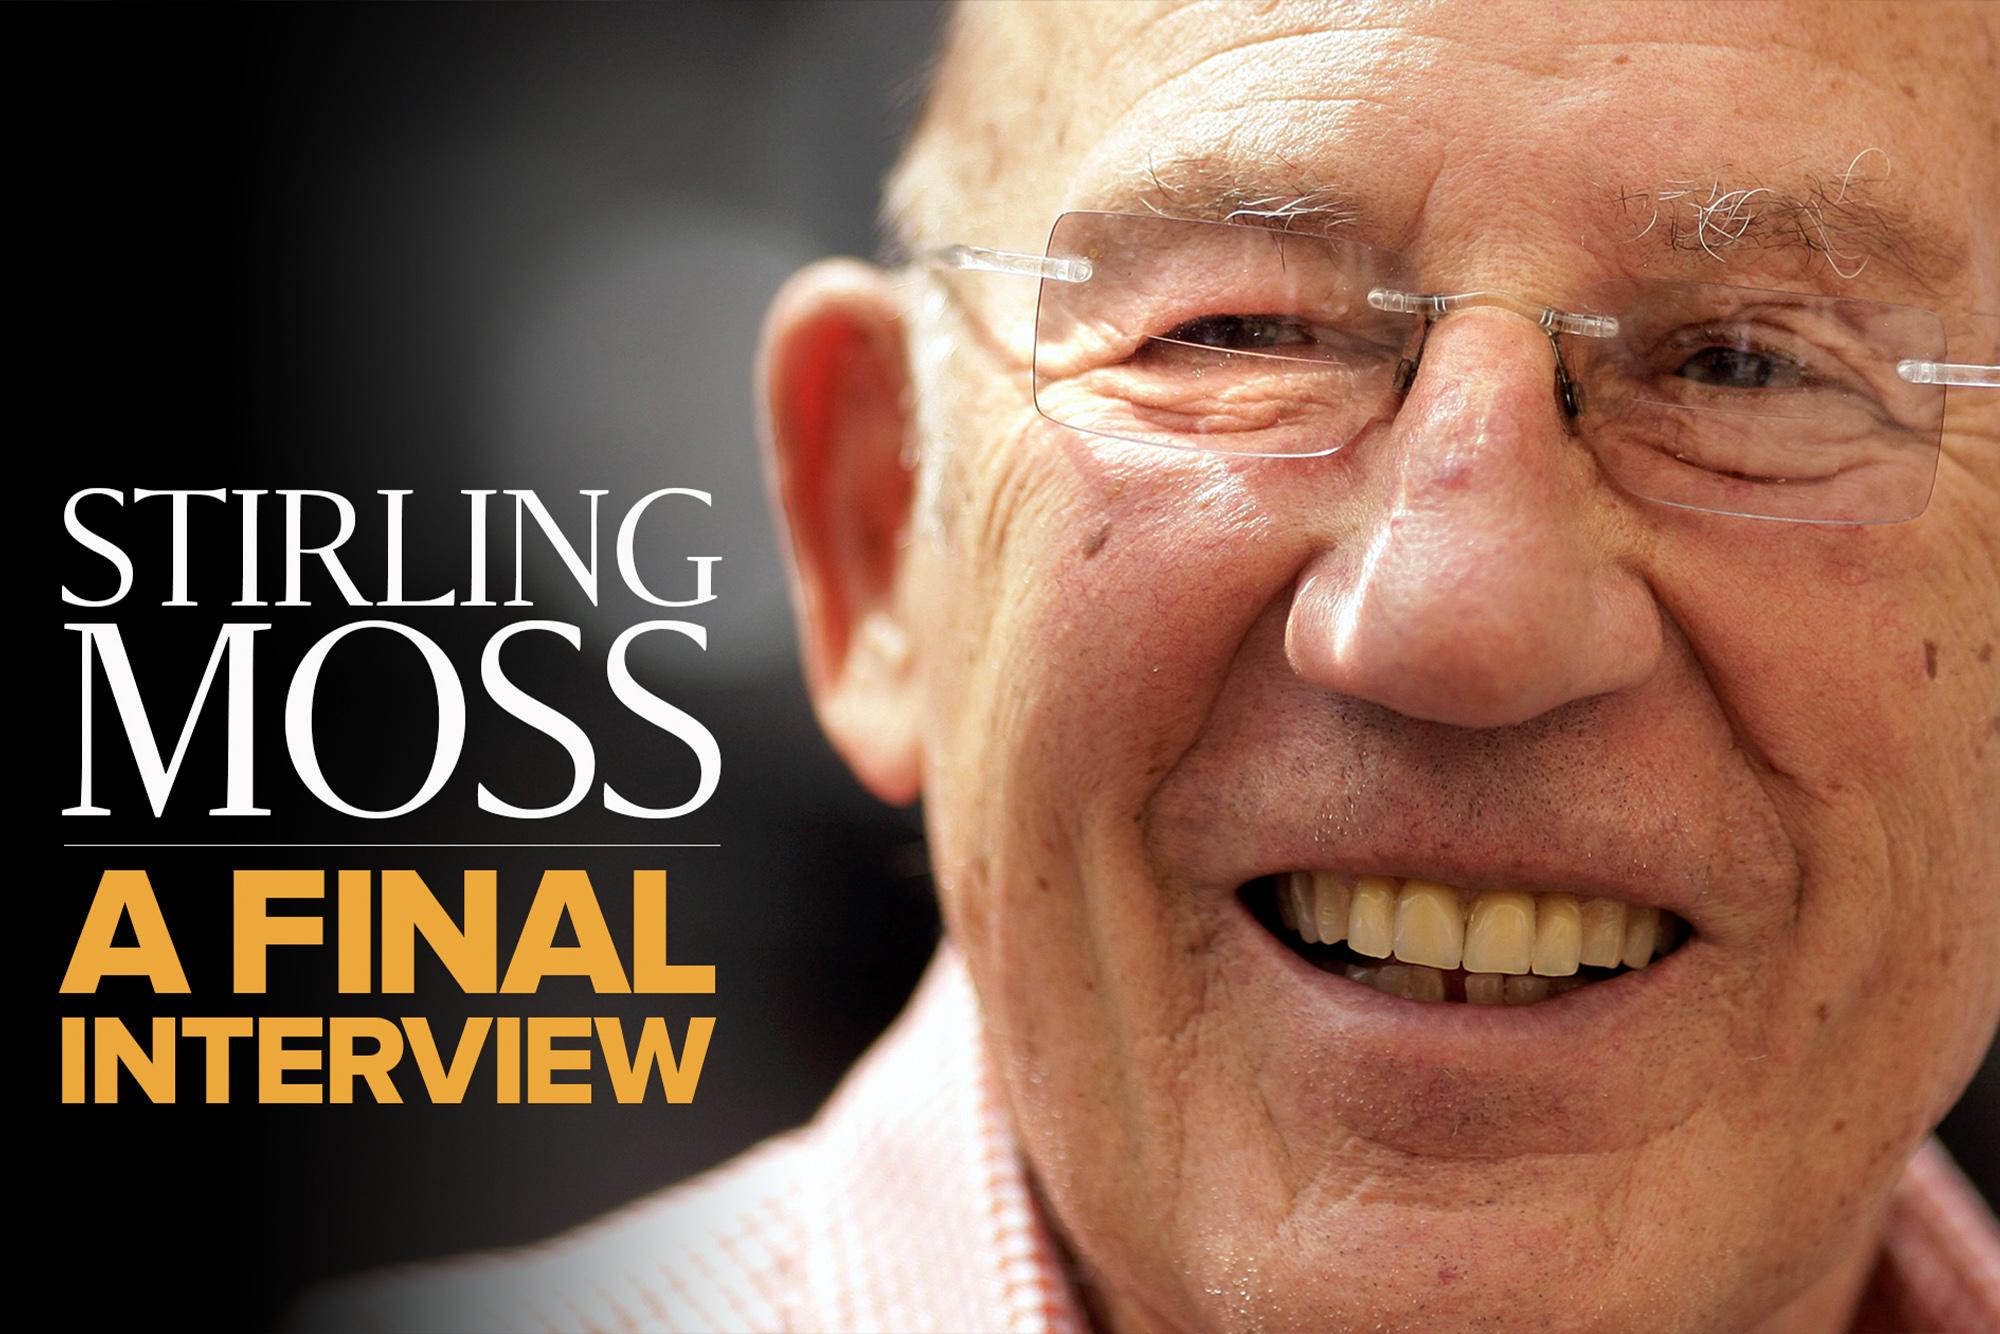 Video: Stirling Moss, a final interview